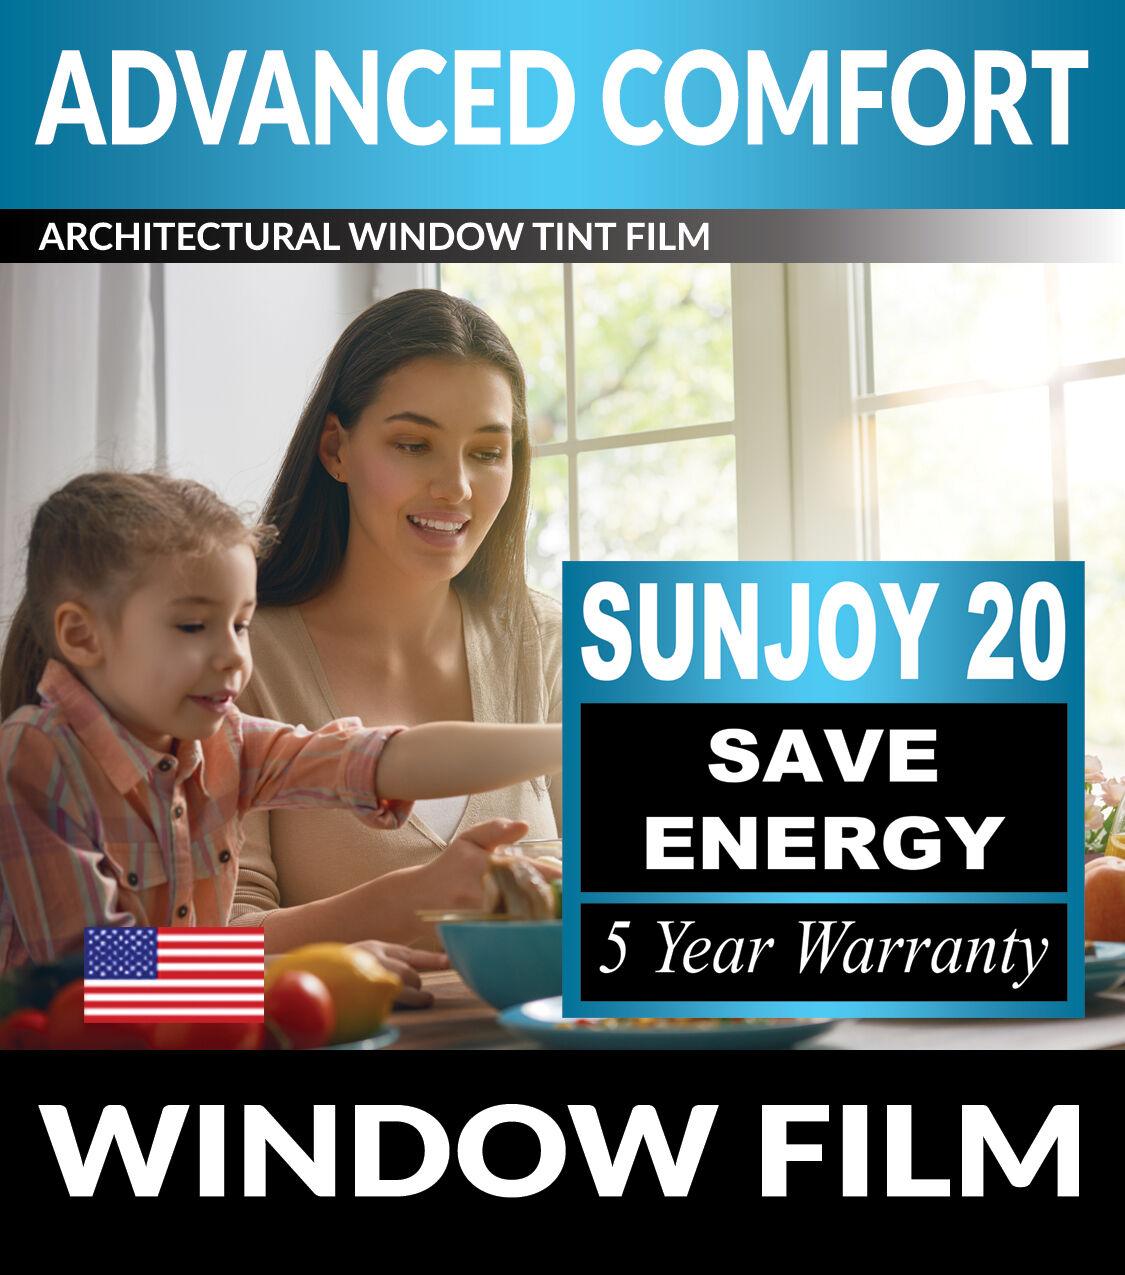 SunJoy 20 Home Commercial Window Tint Film Solar UV Glare Heat Control Privacy